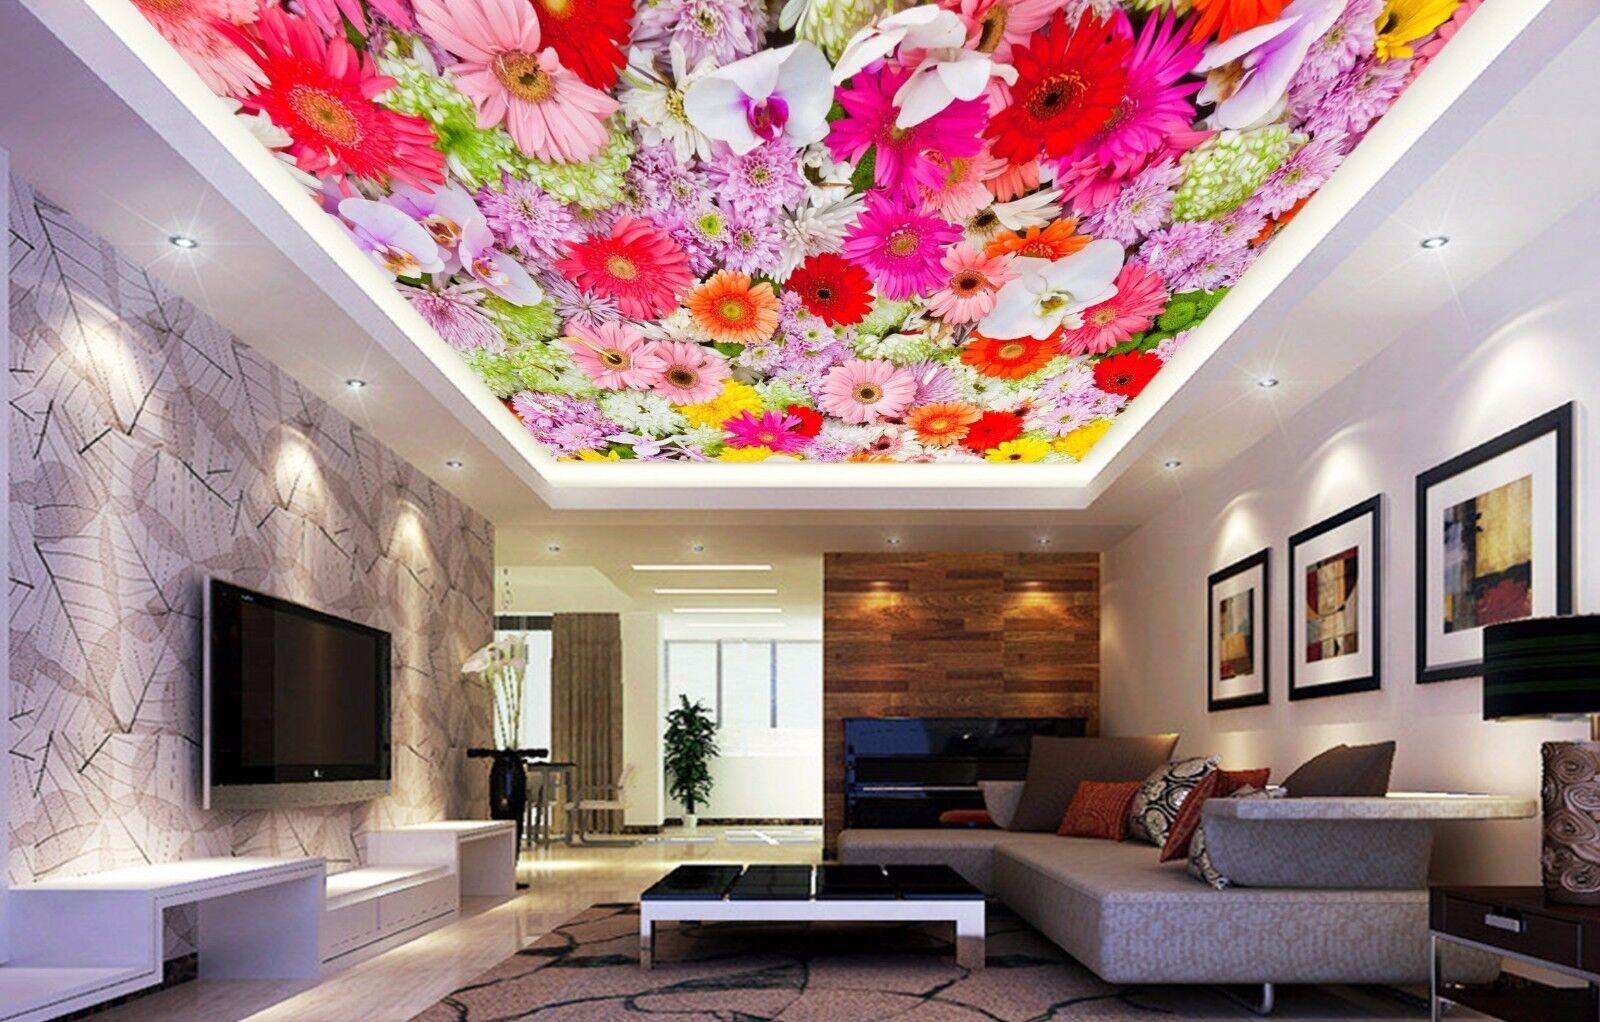 3D Daisy Flower 9 Ceiling WallPaper Murals Wall Print Decal Deco AJ WALLPAPER GB